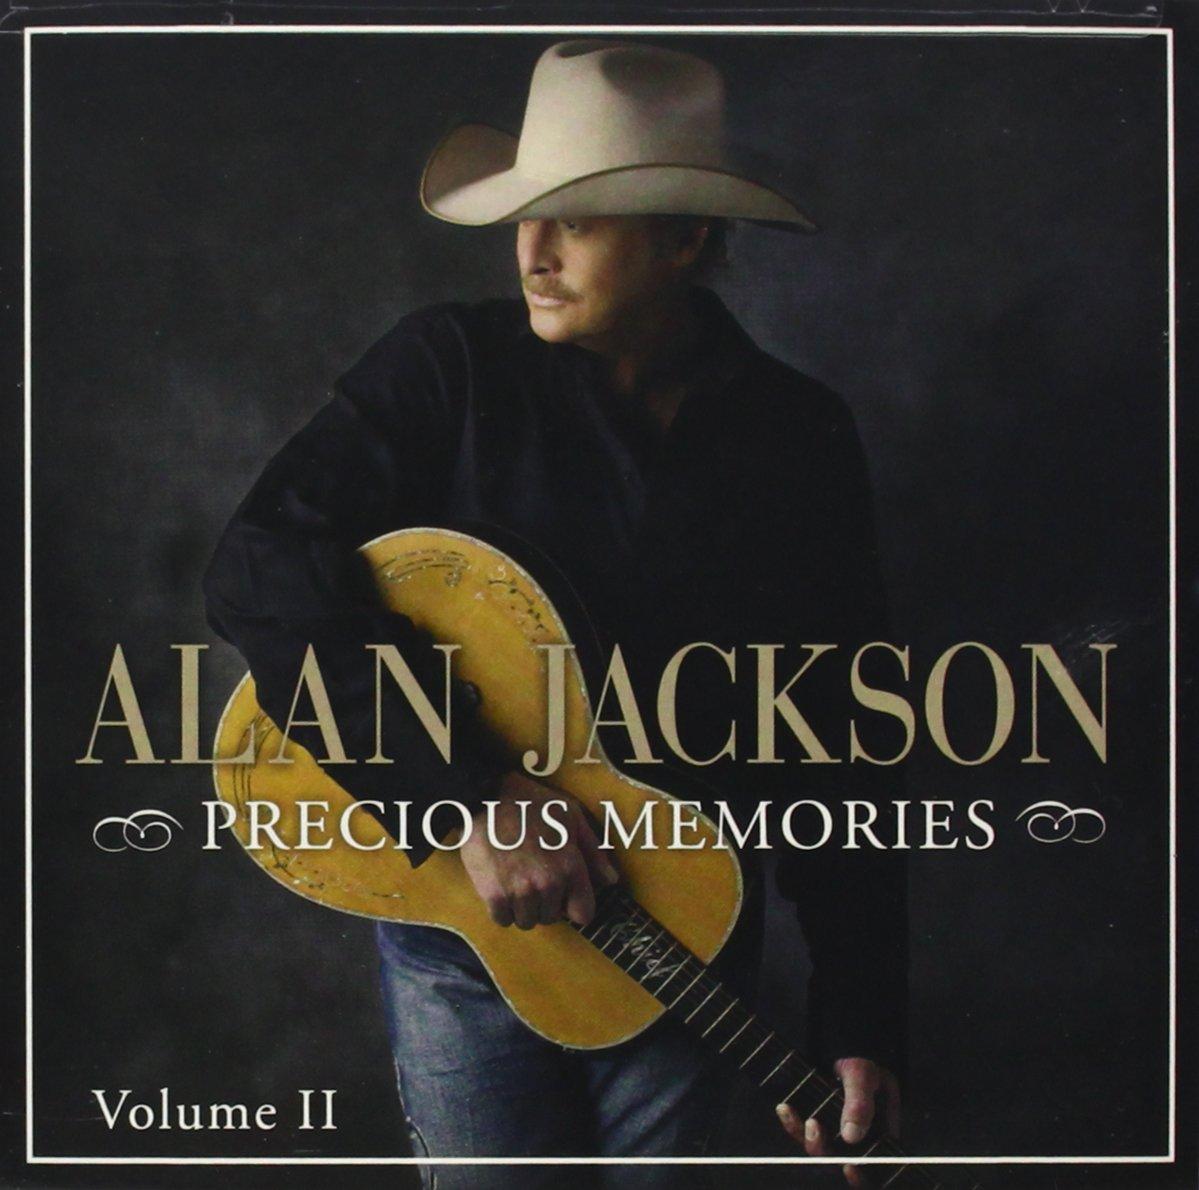 Precious Memories: Vol. II